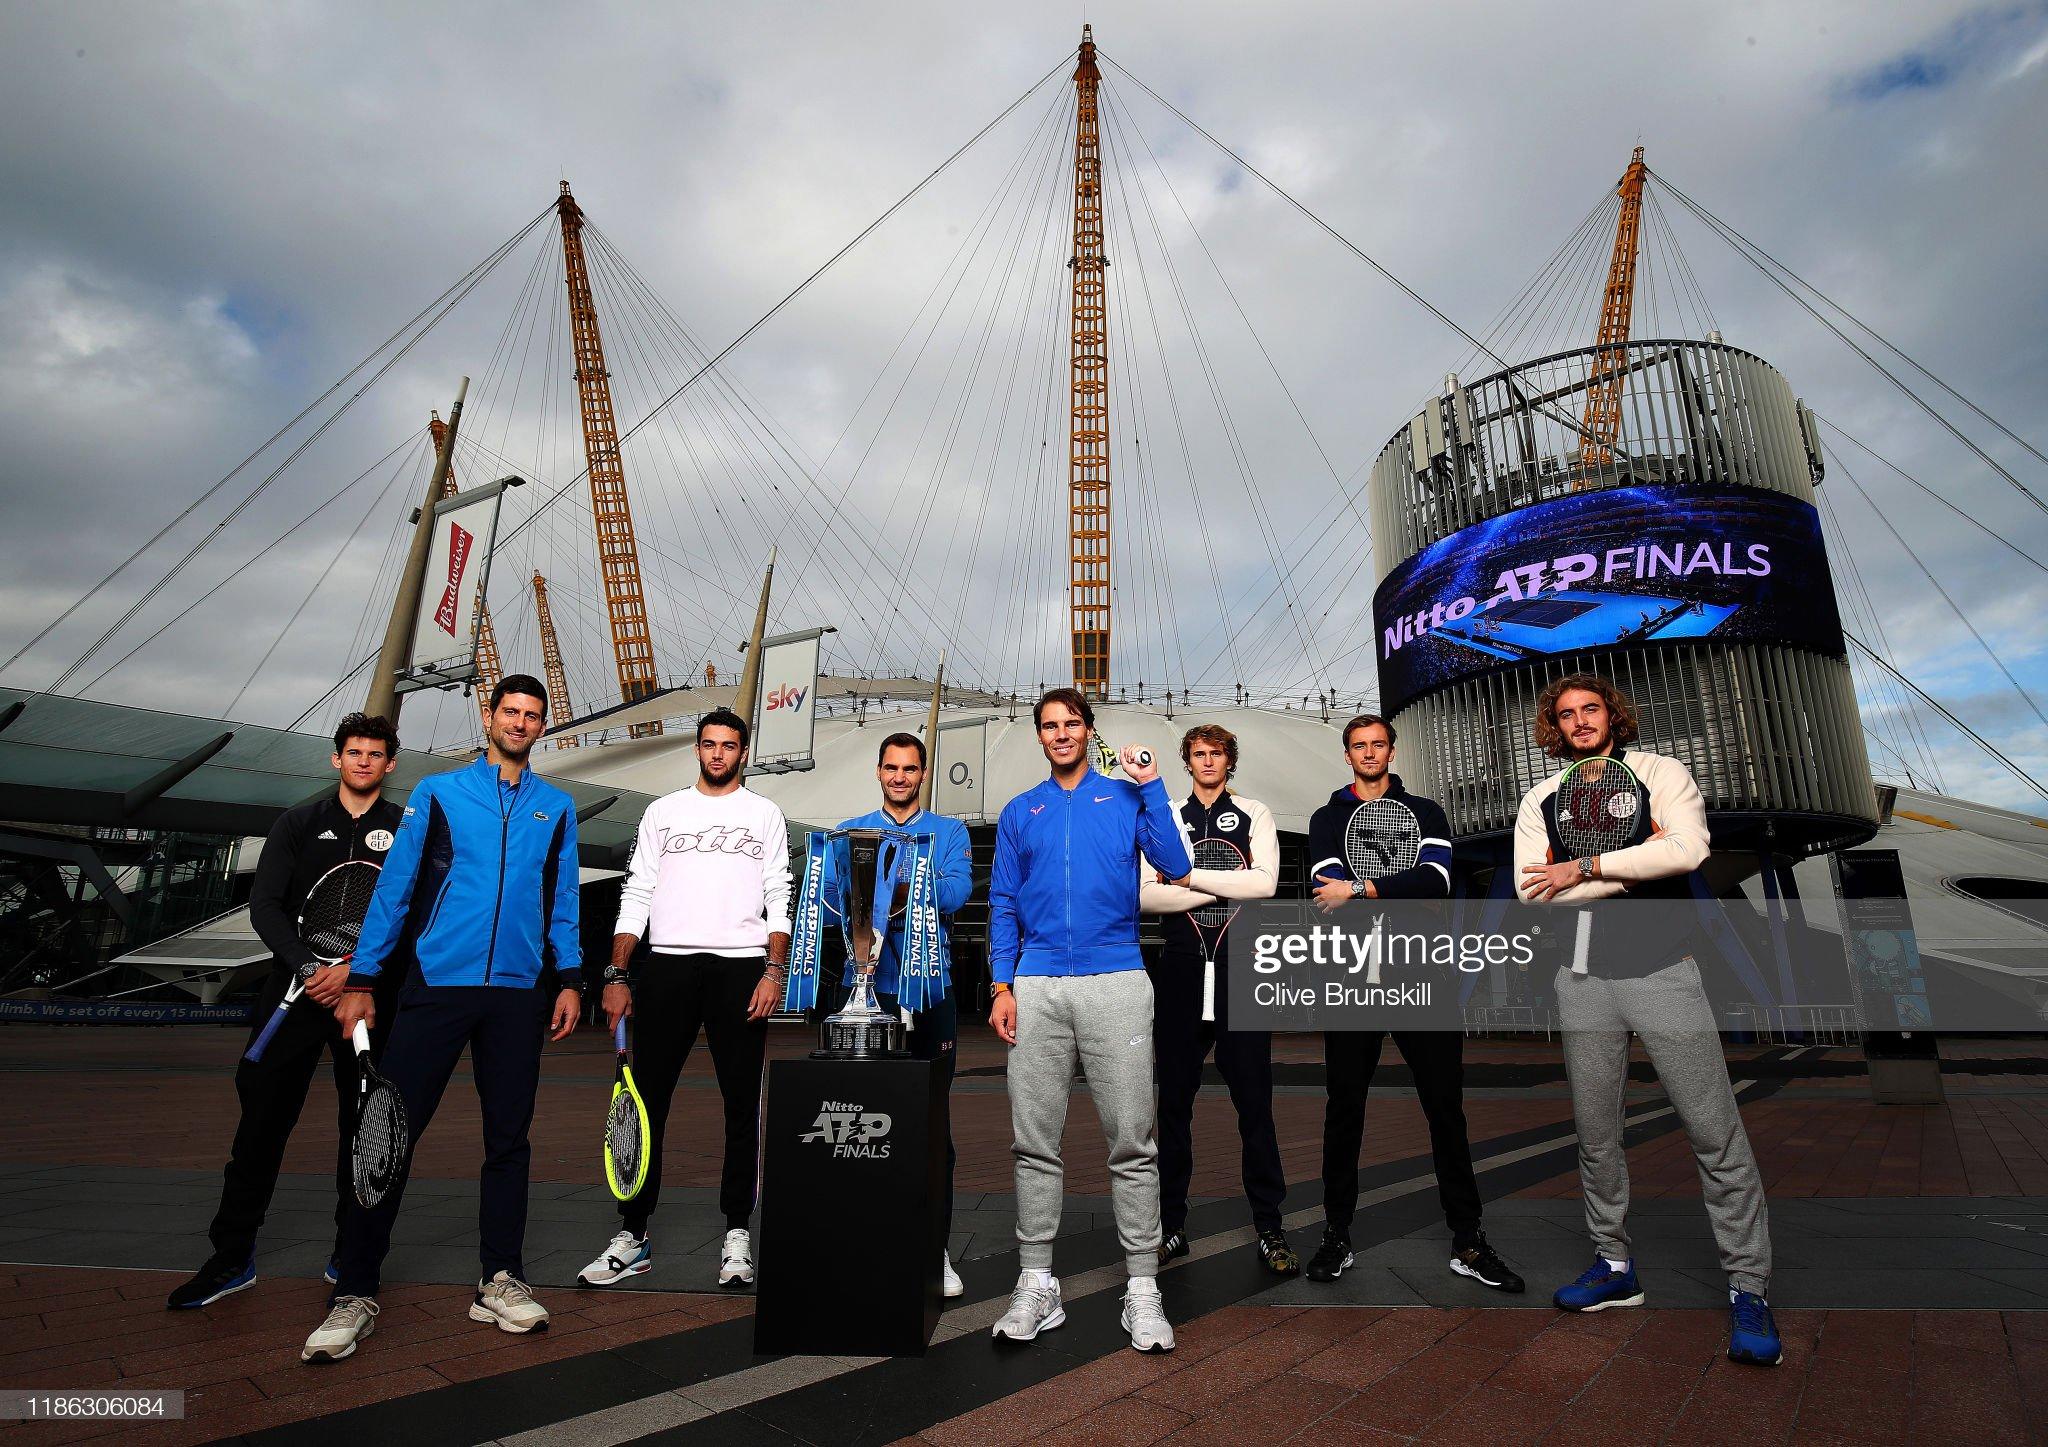 Nitto ATP World Tour Finals - Previews : News Photo